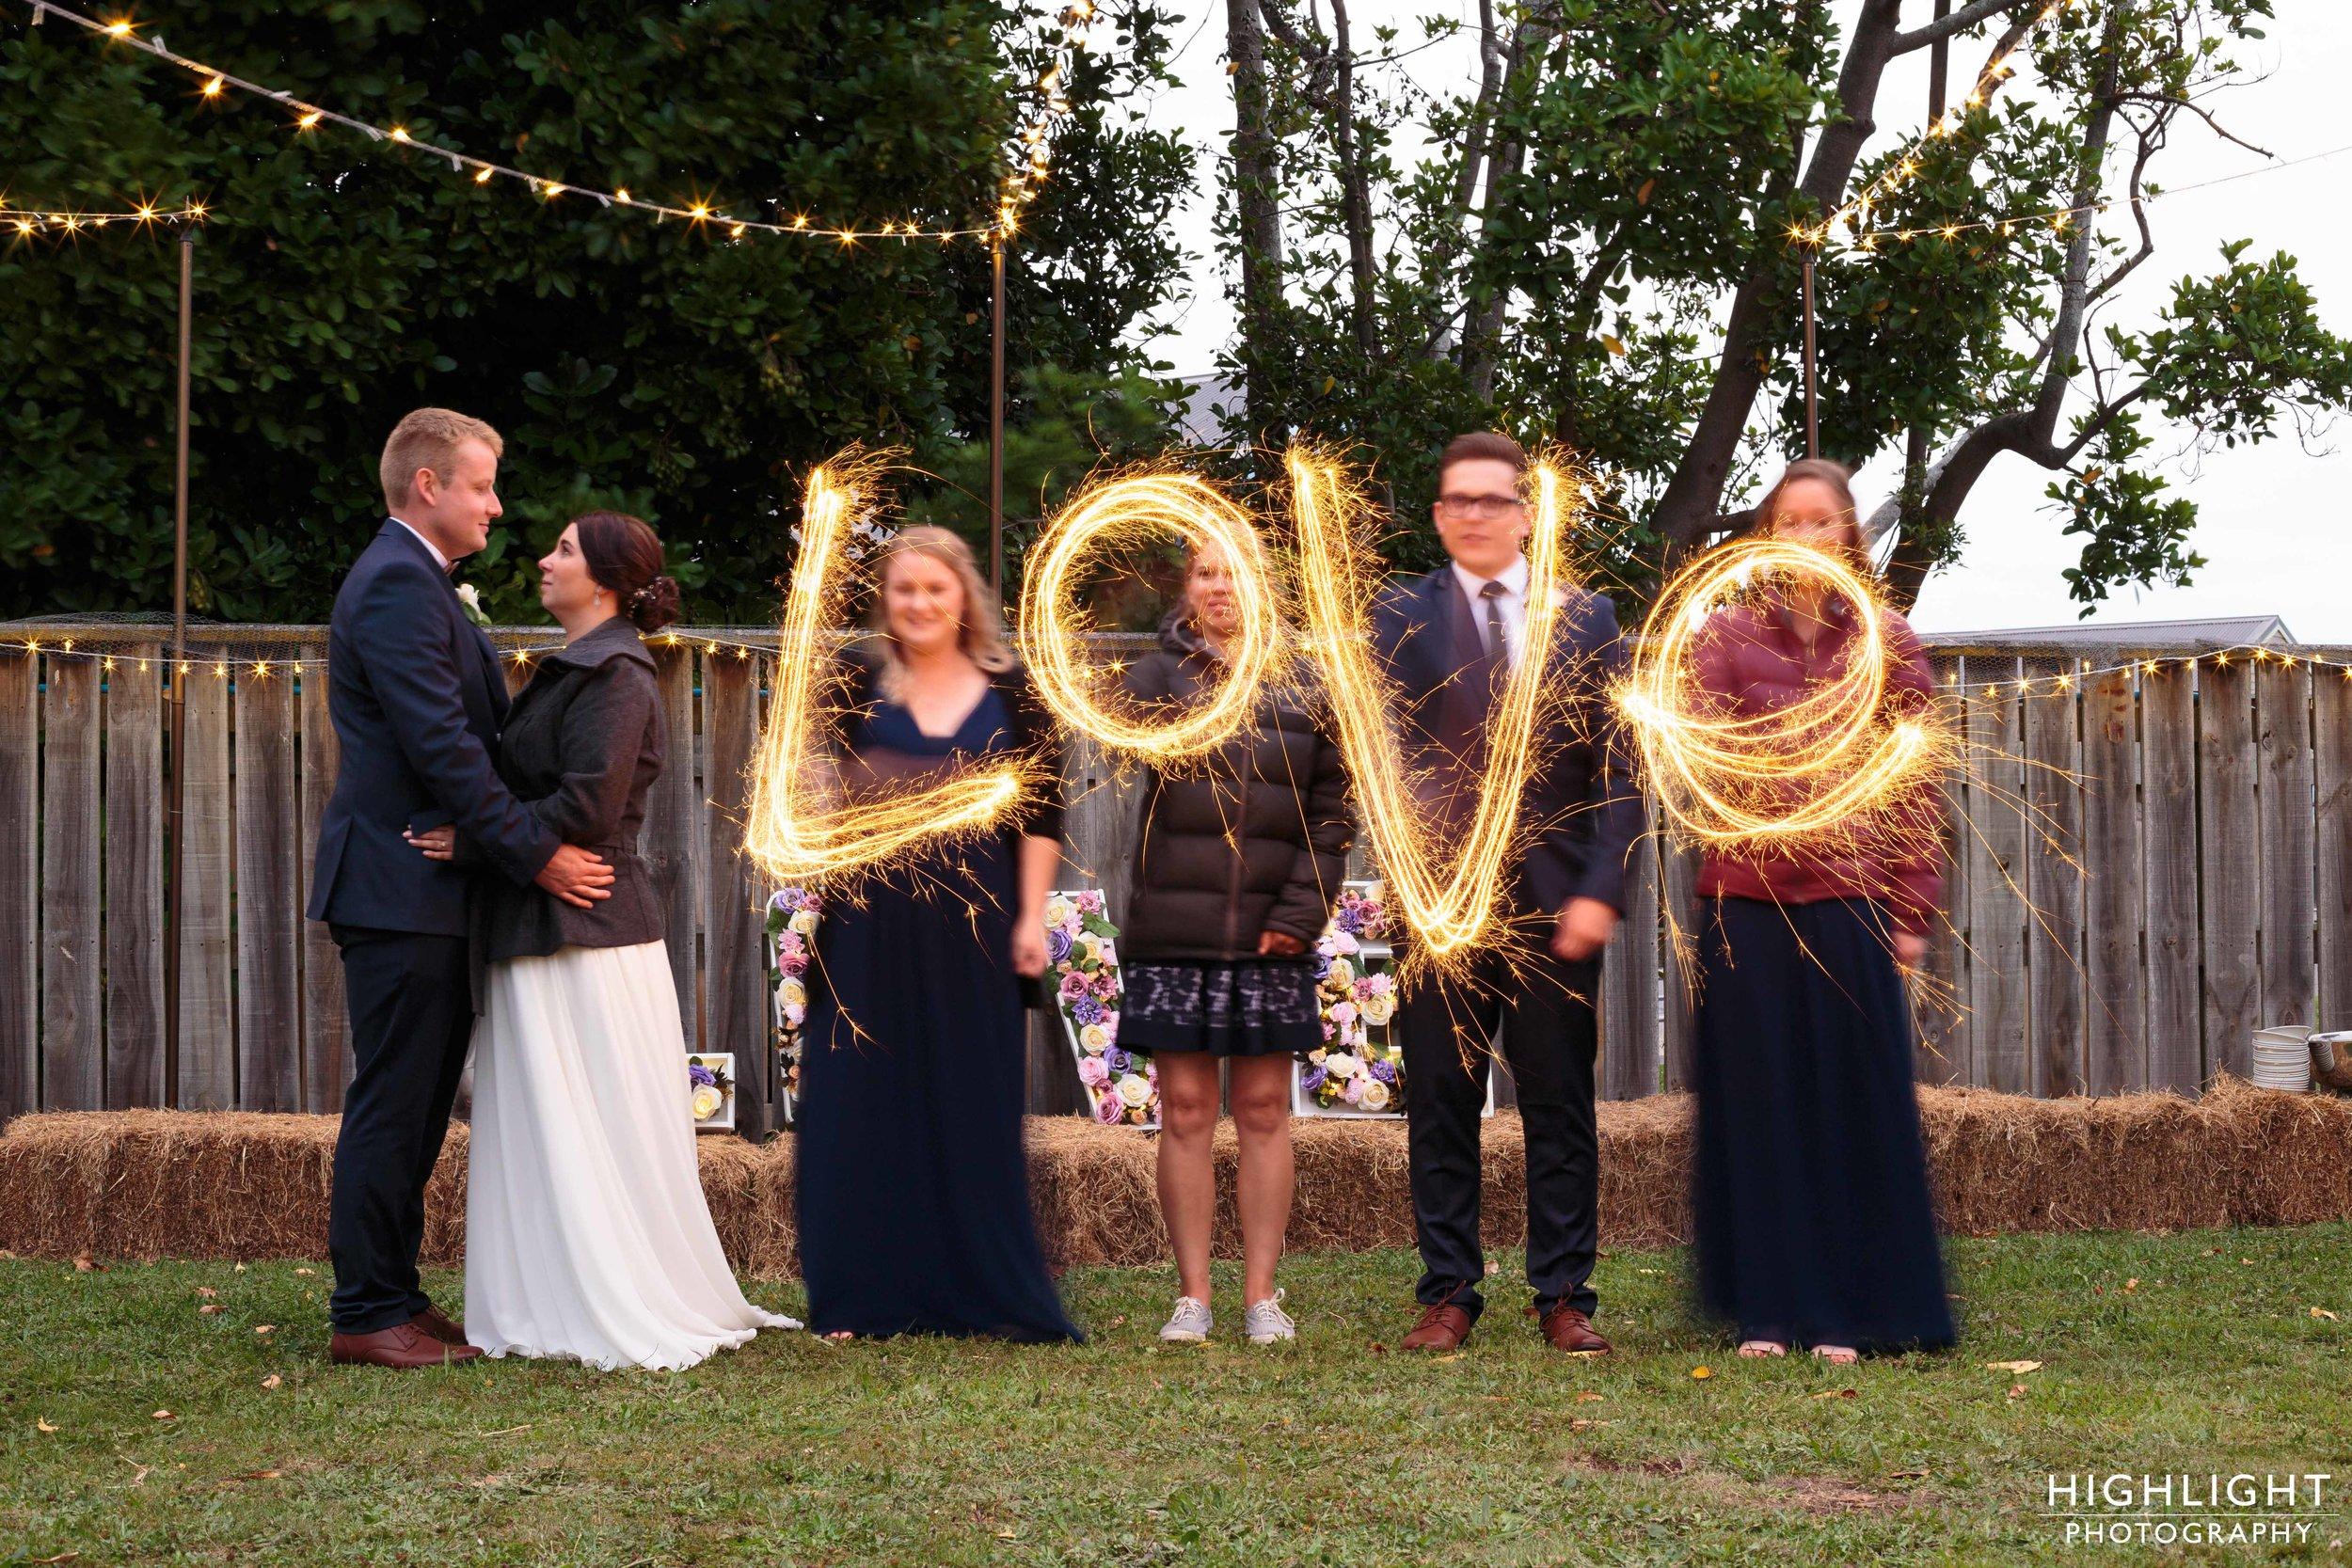 JM-2017-Highlight-wedding-photography-palmerston-north-new-zealand-242.jpg